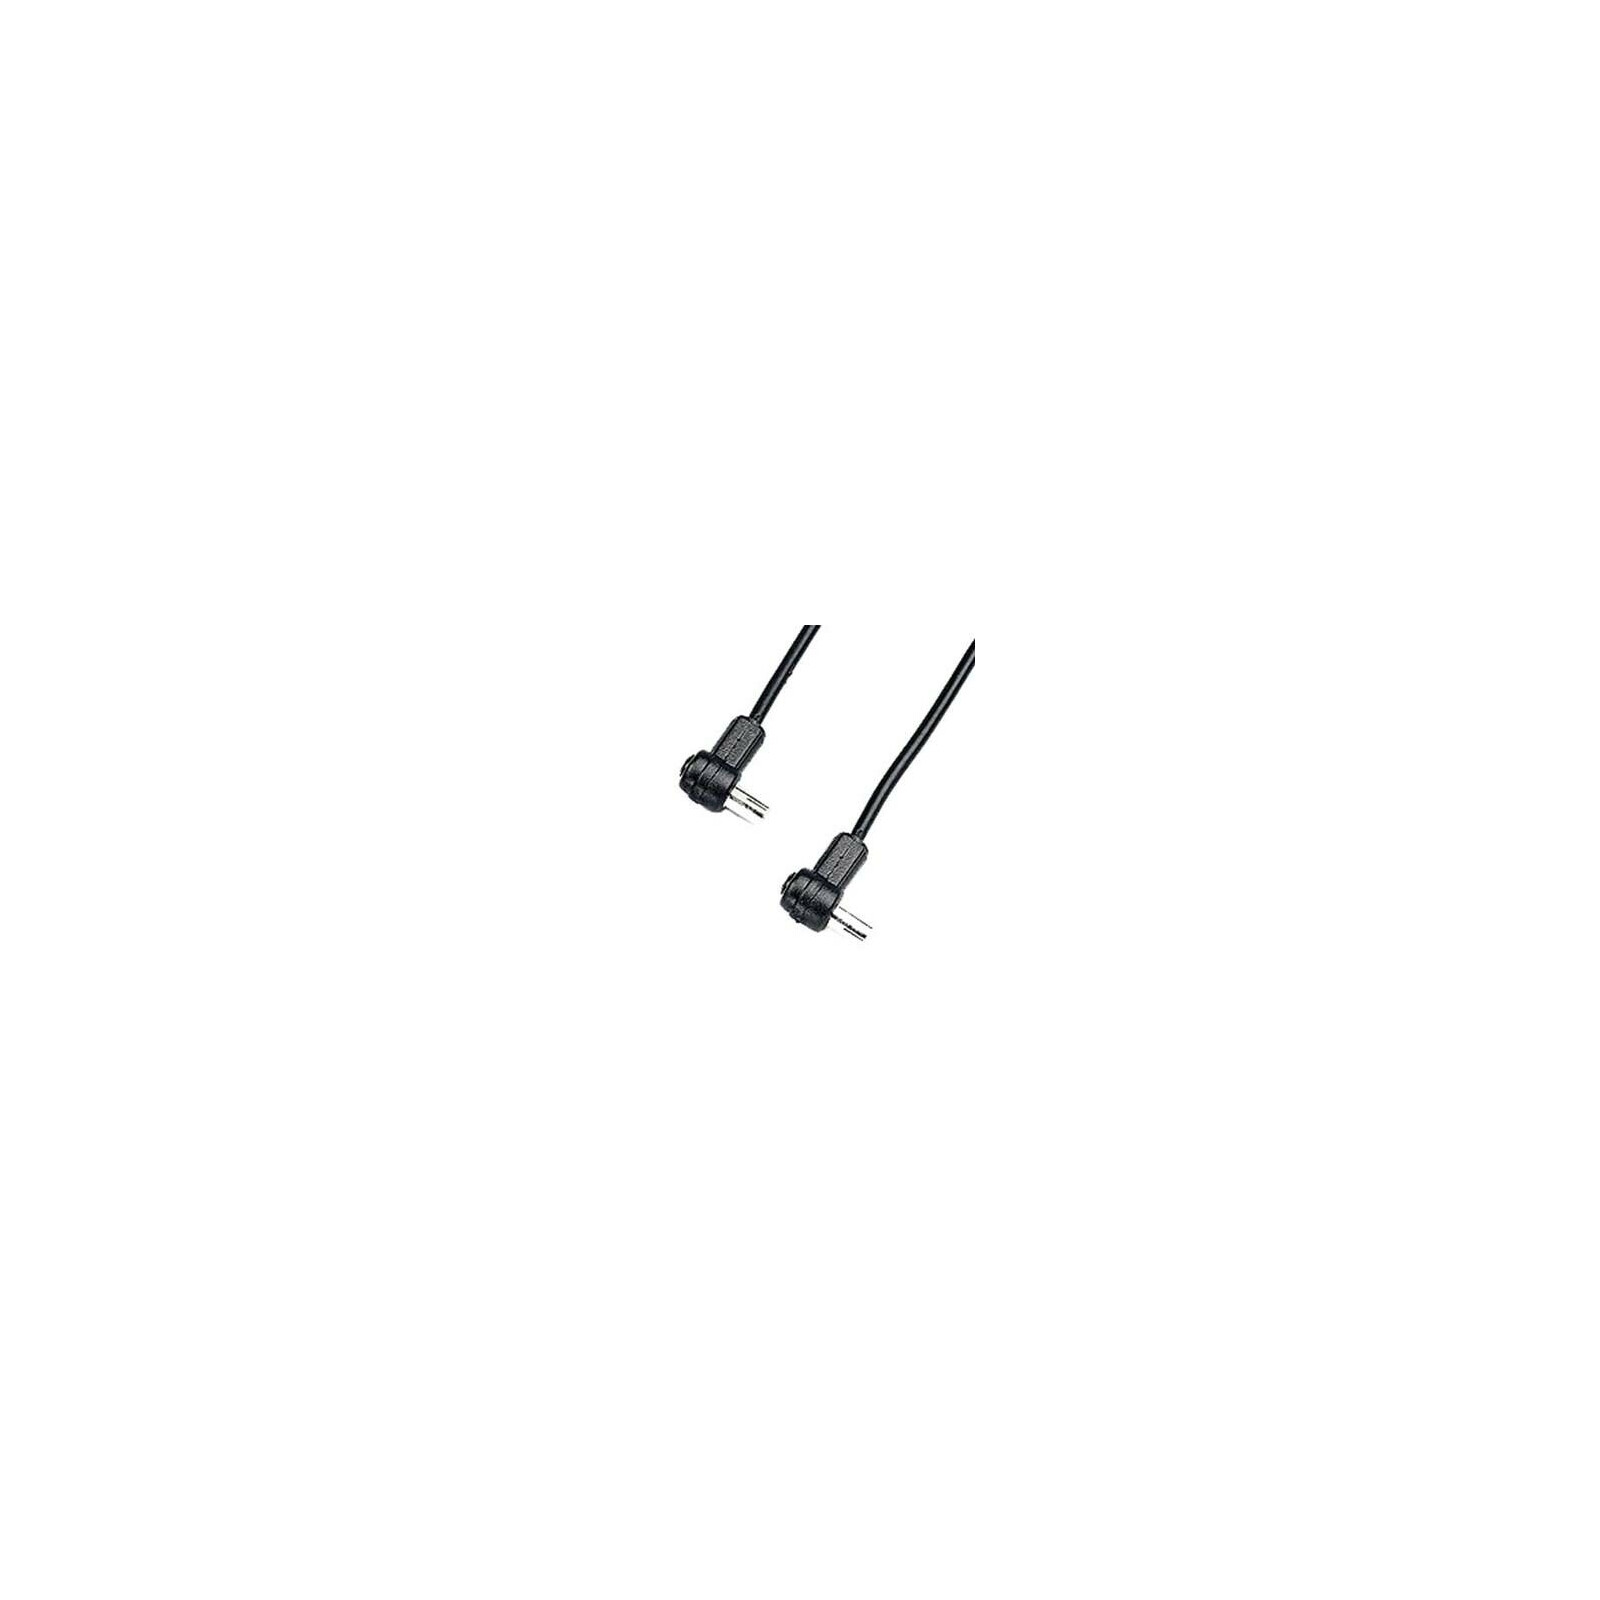 "Hama 6980 Blitz-Anschlusskabel ""Winkel"", 0,2 m"